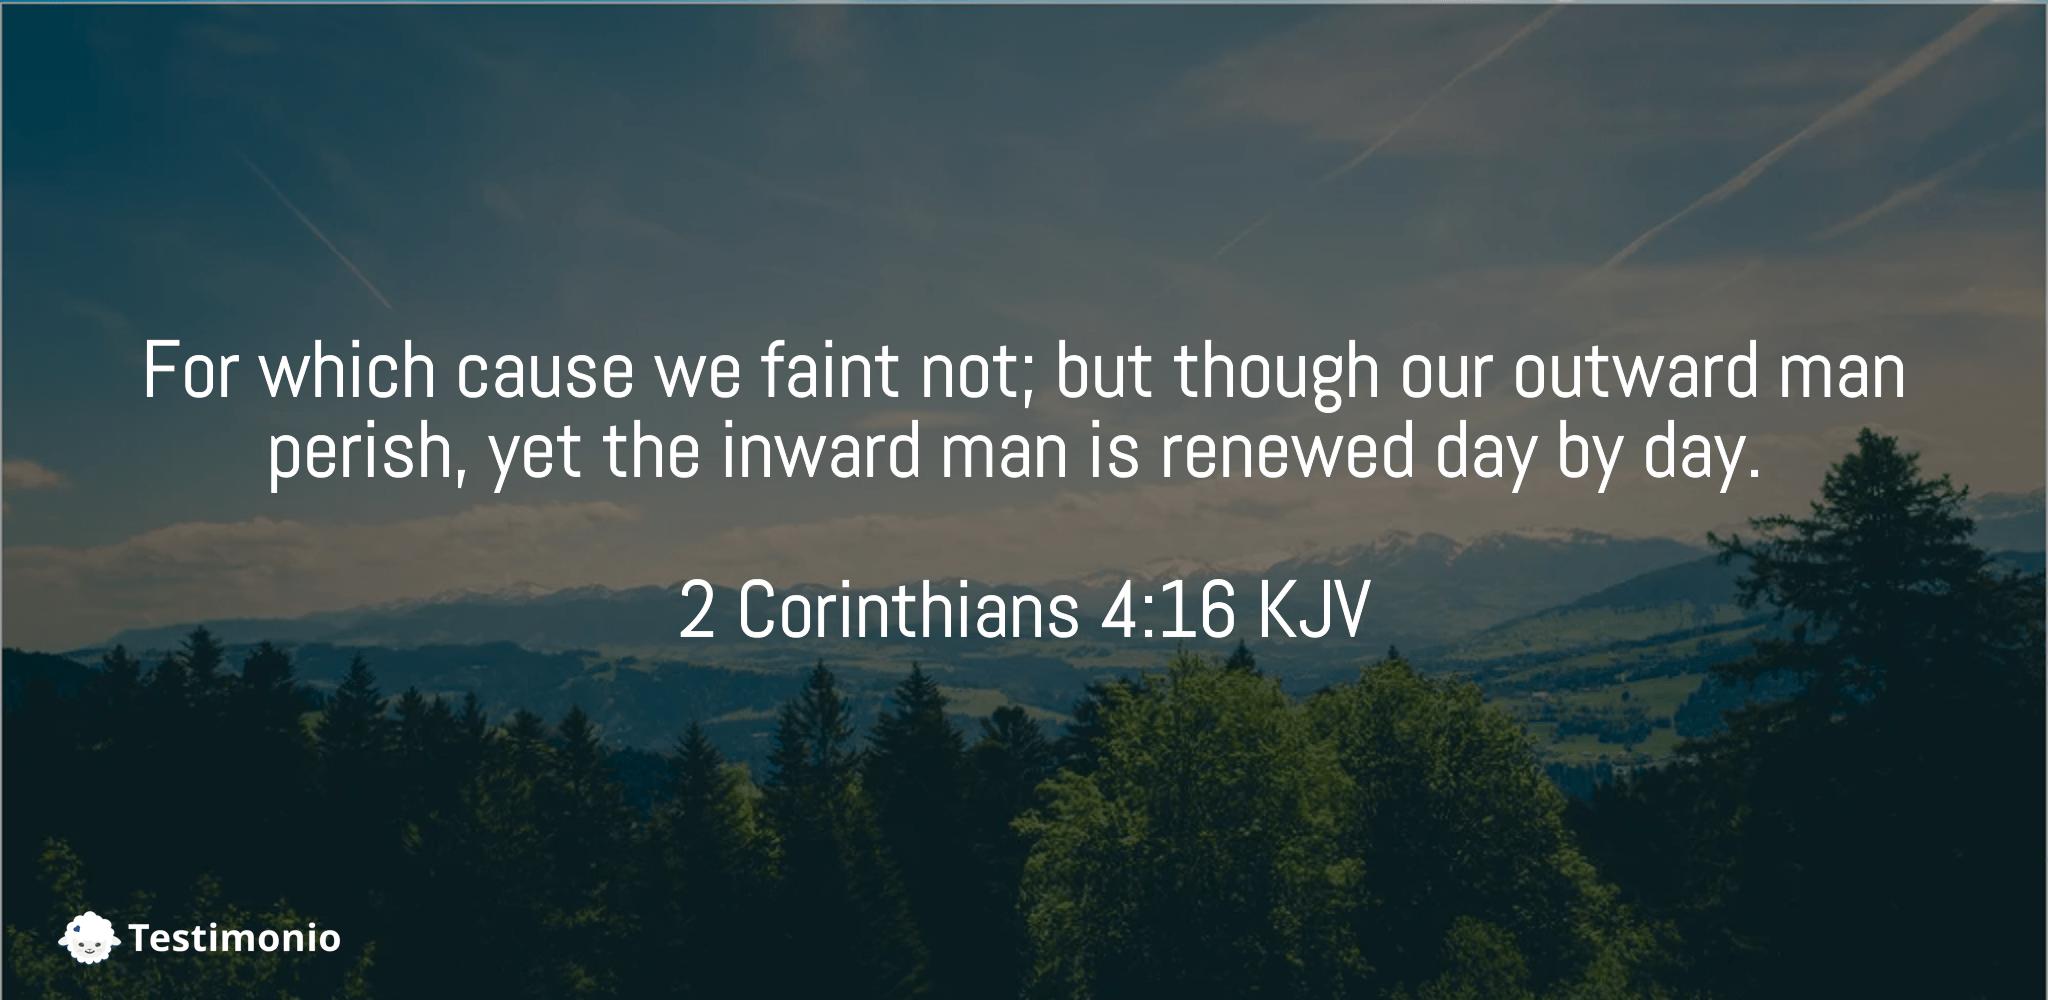 2 Corinthians 4:16